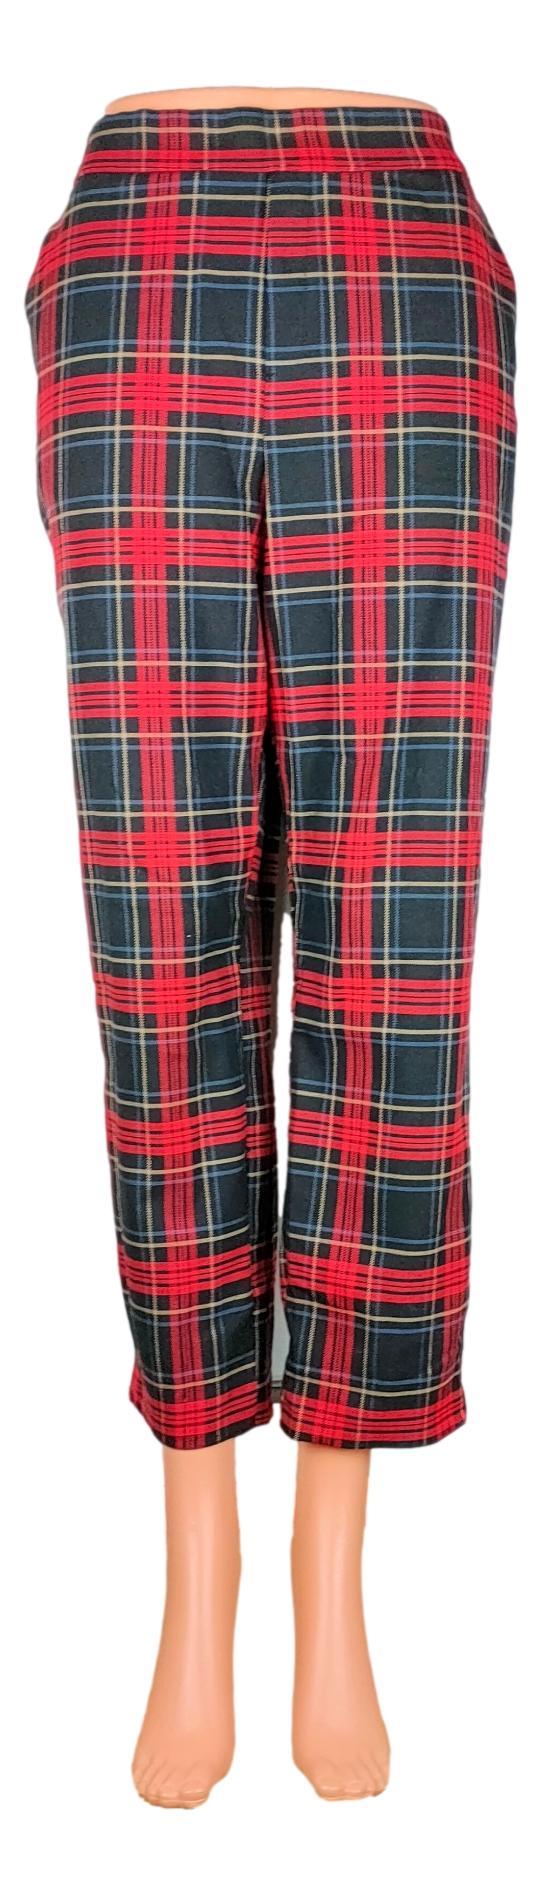 Pantalon Zara -Taille XL